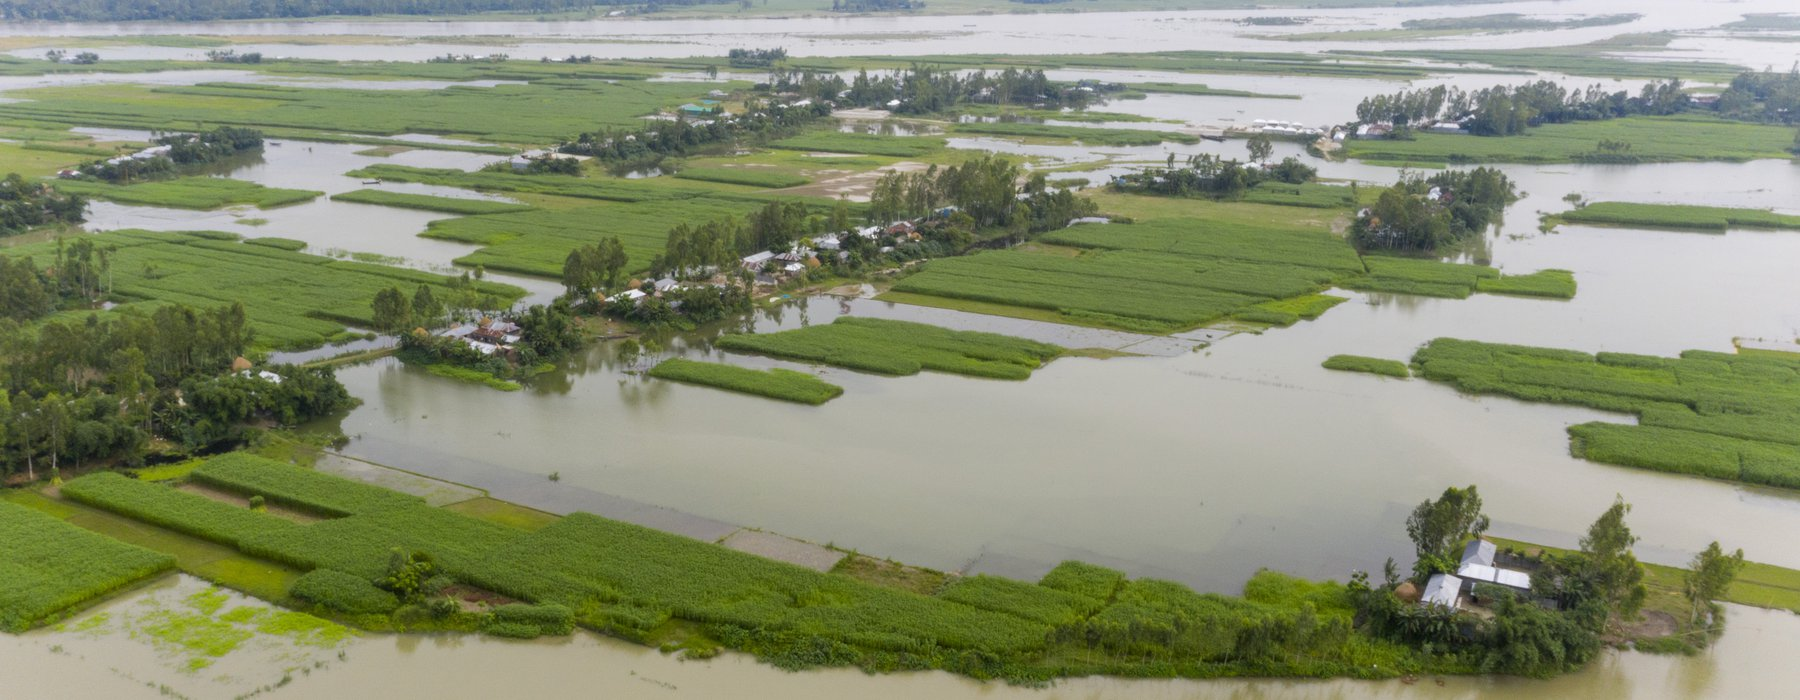 Flooded fields in Bangladesh